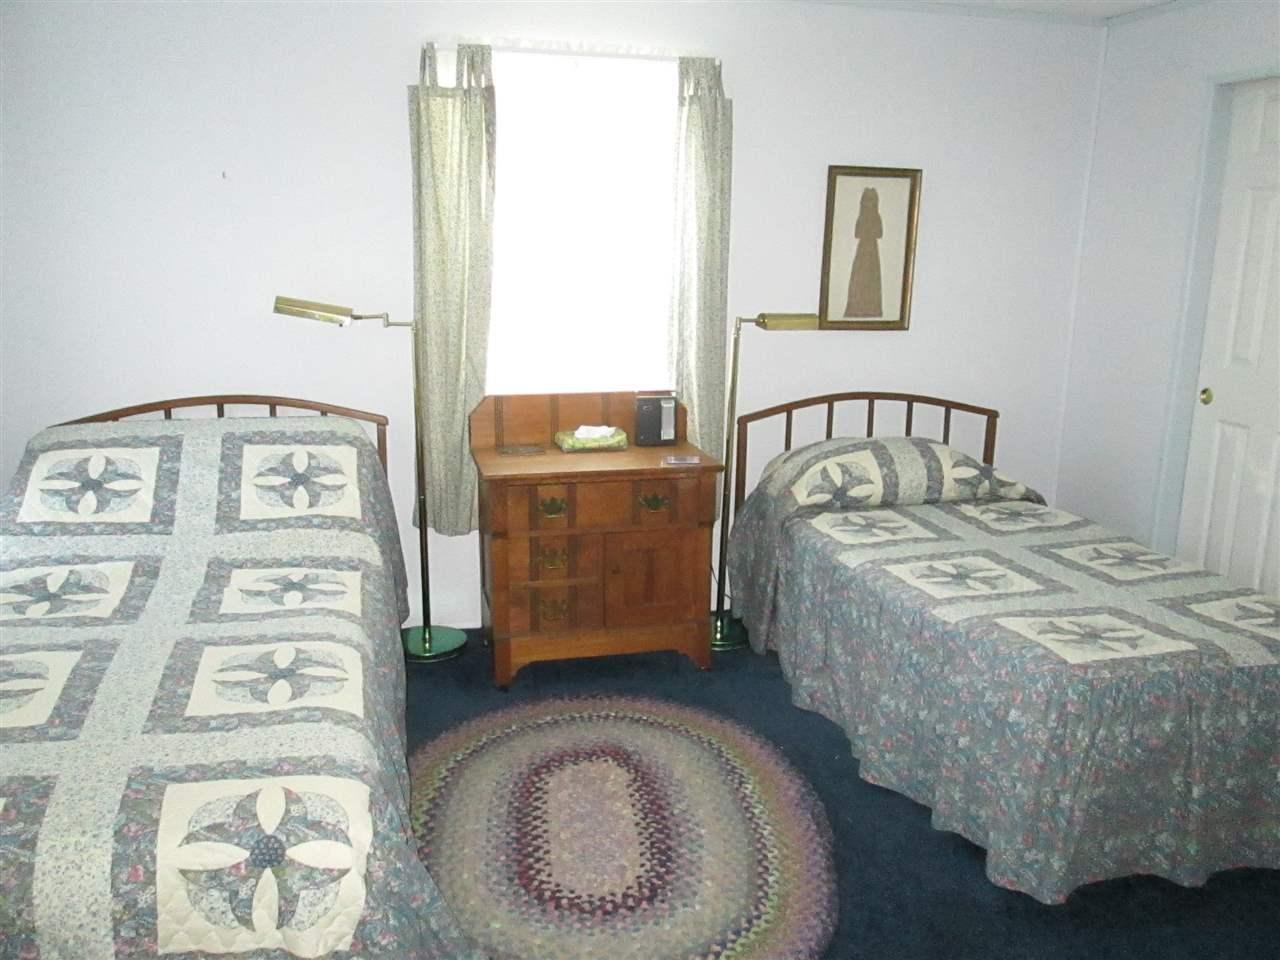 183 DEER PATH, HOPKINTON, NH 03229  Photo 10